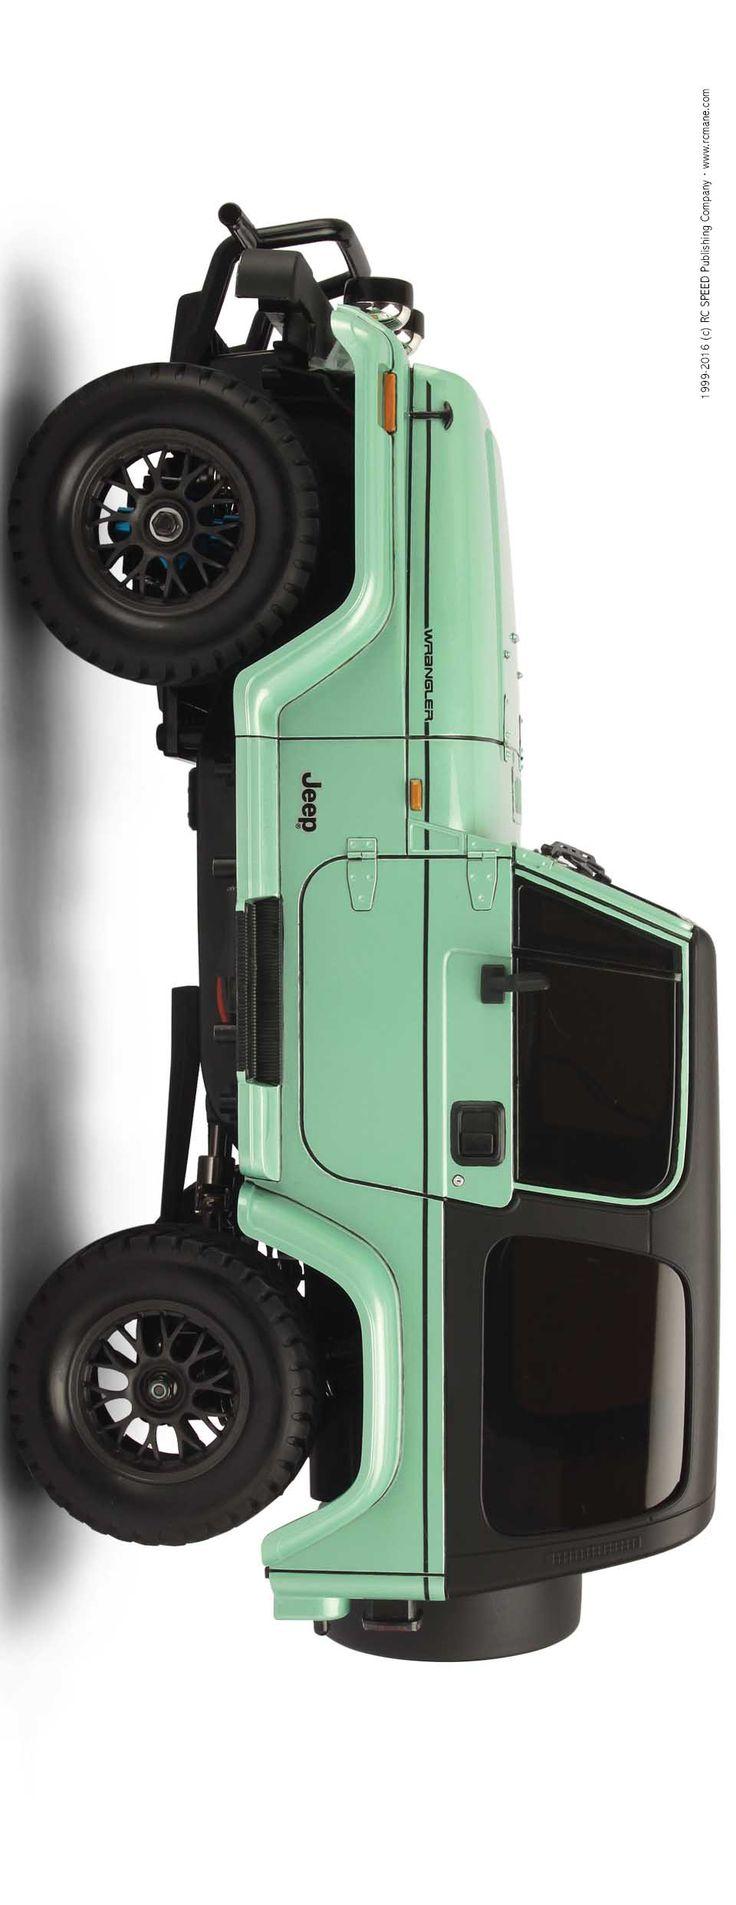 SA070 - Tamiya Item.84071 (2009) CC-01 Chassis Jeep Wrangler(YJ), Off-Road 1/10 Shaft Driven 4WD RC Car -Bodyworks by:CY Ning, Supplier by: Waigo Model Hobbies Ltd.